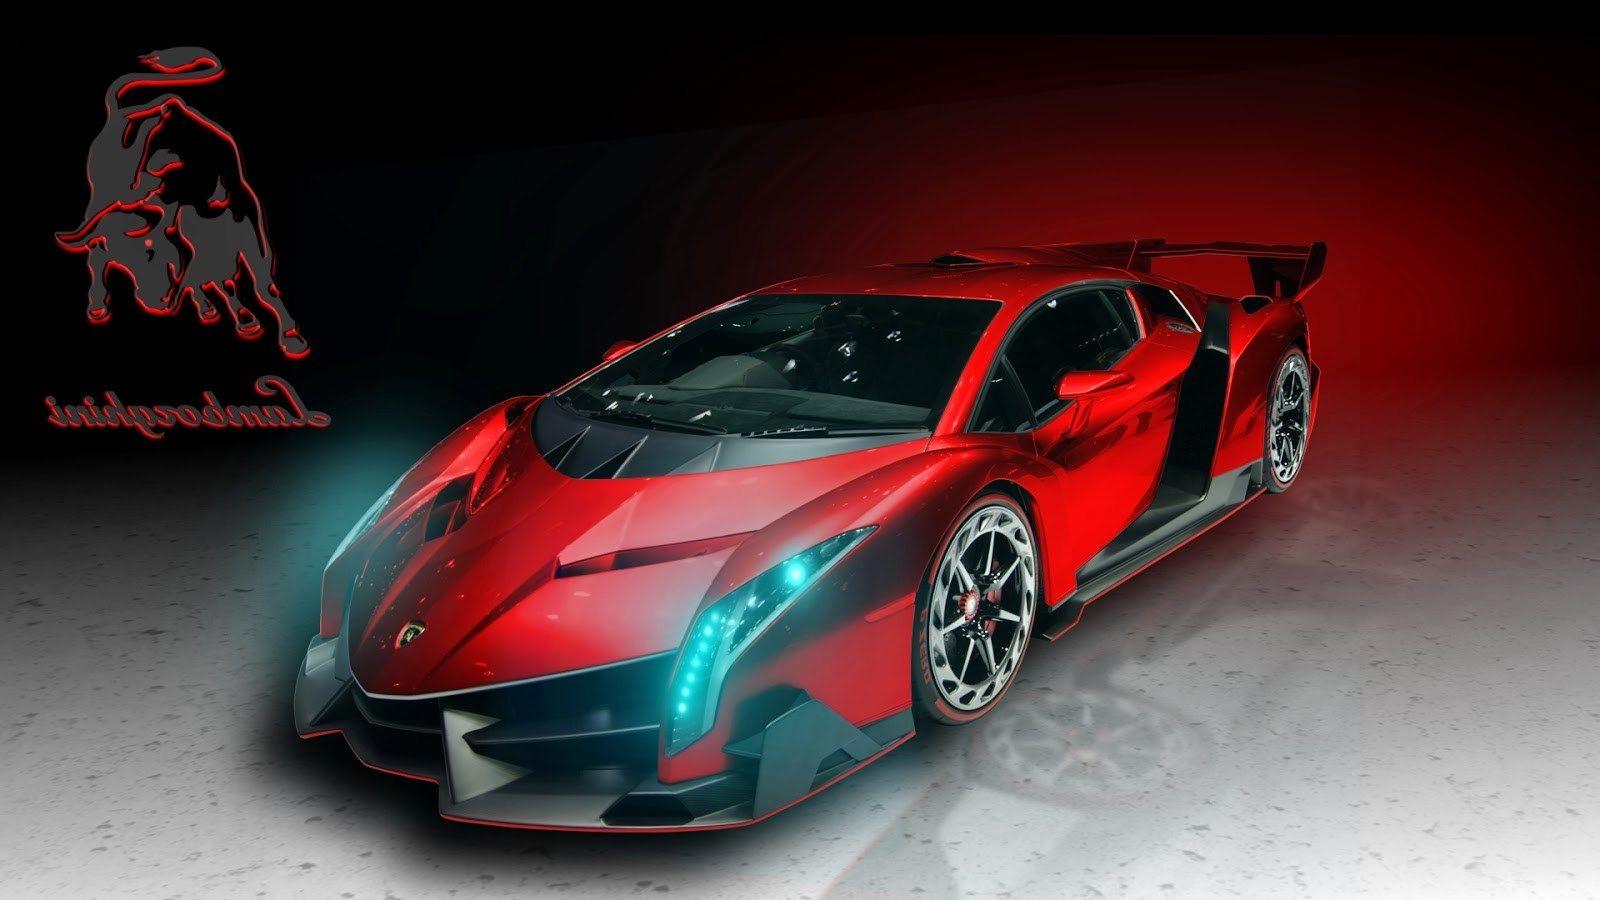 Bildergebnis für Lamborghini veneno roadster